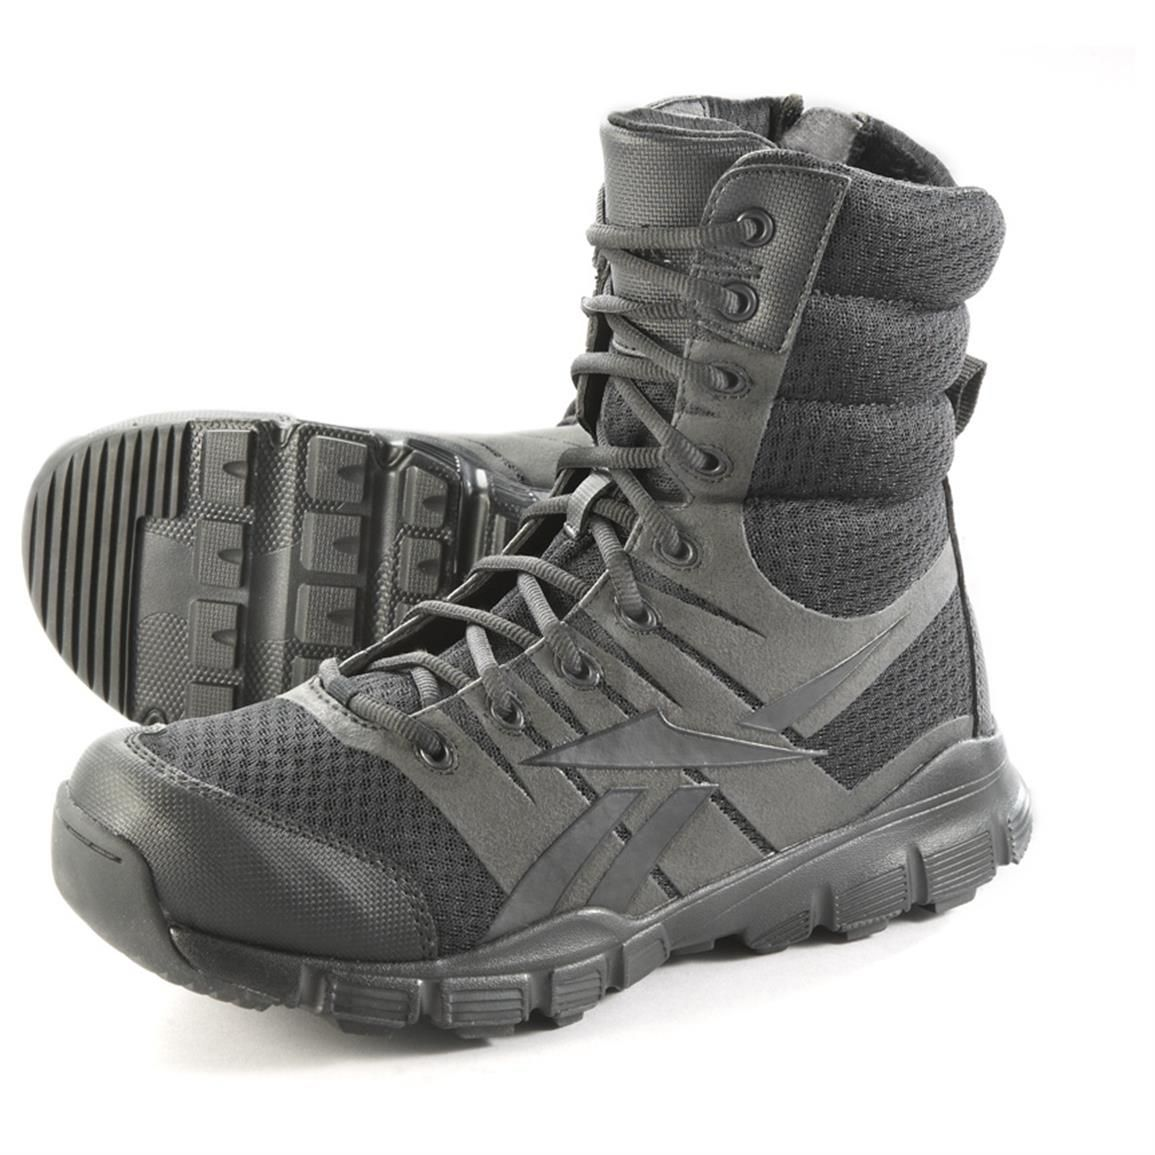 reebok police boots